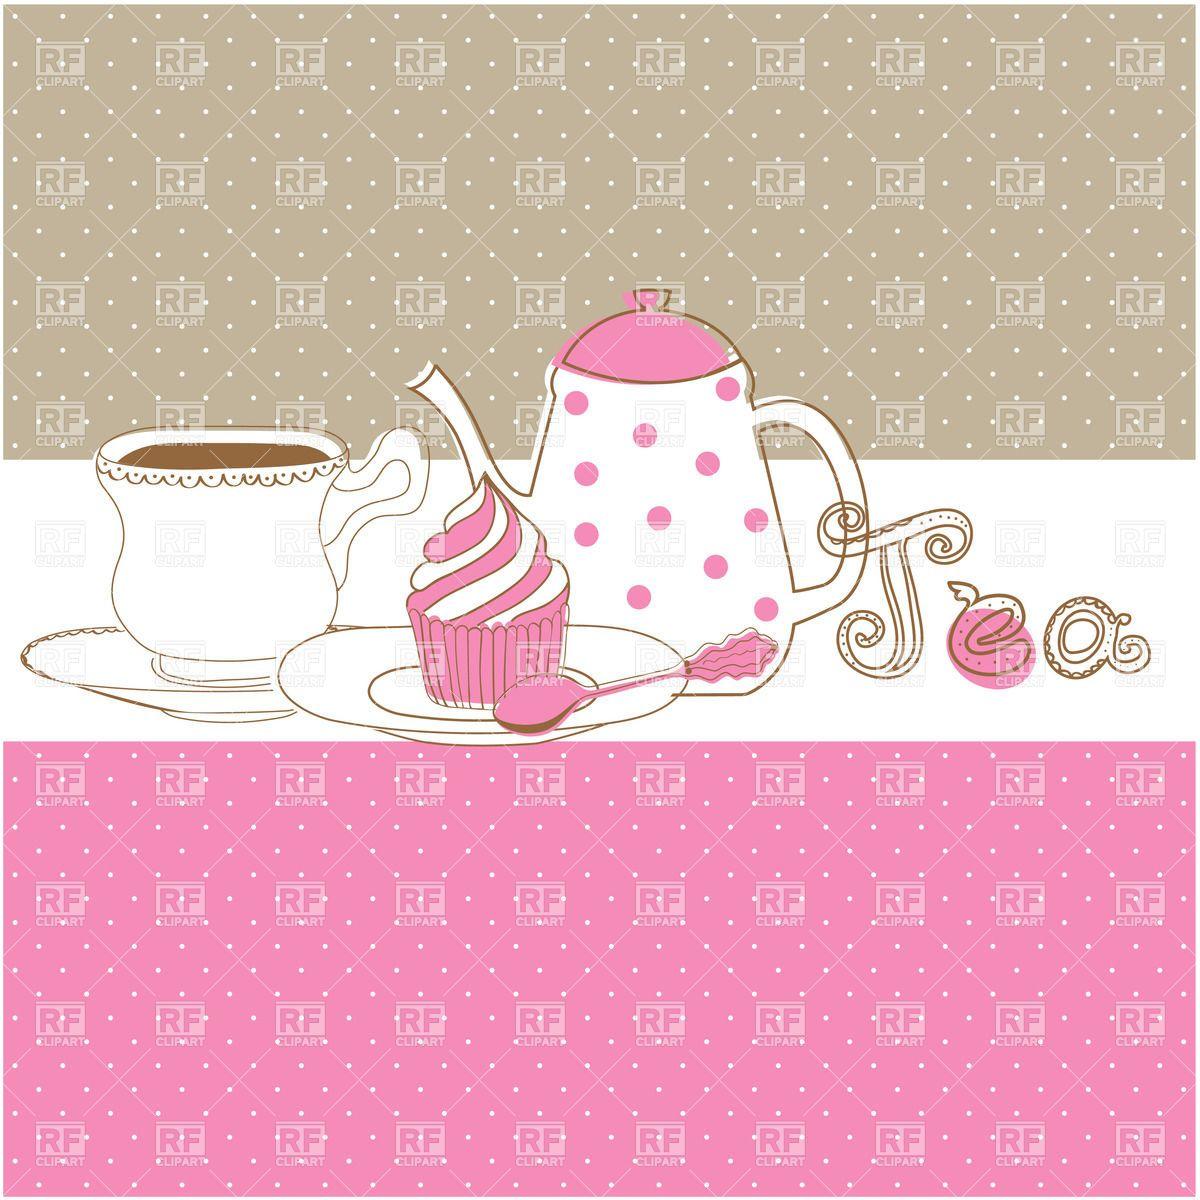 Elegant tea party invitation template with teacups cartoon vector - Tea Borders Free Clip Art Tea Drinking Cupcake Teapot And Cup 21858